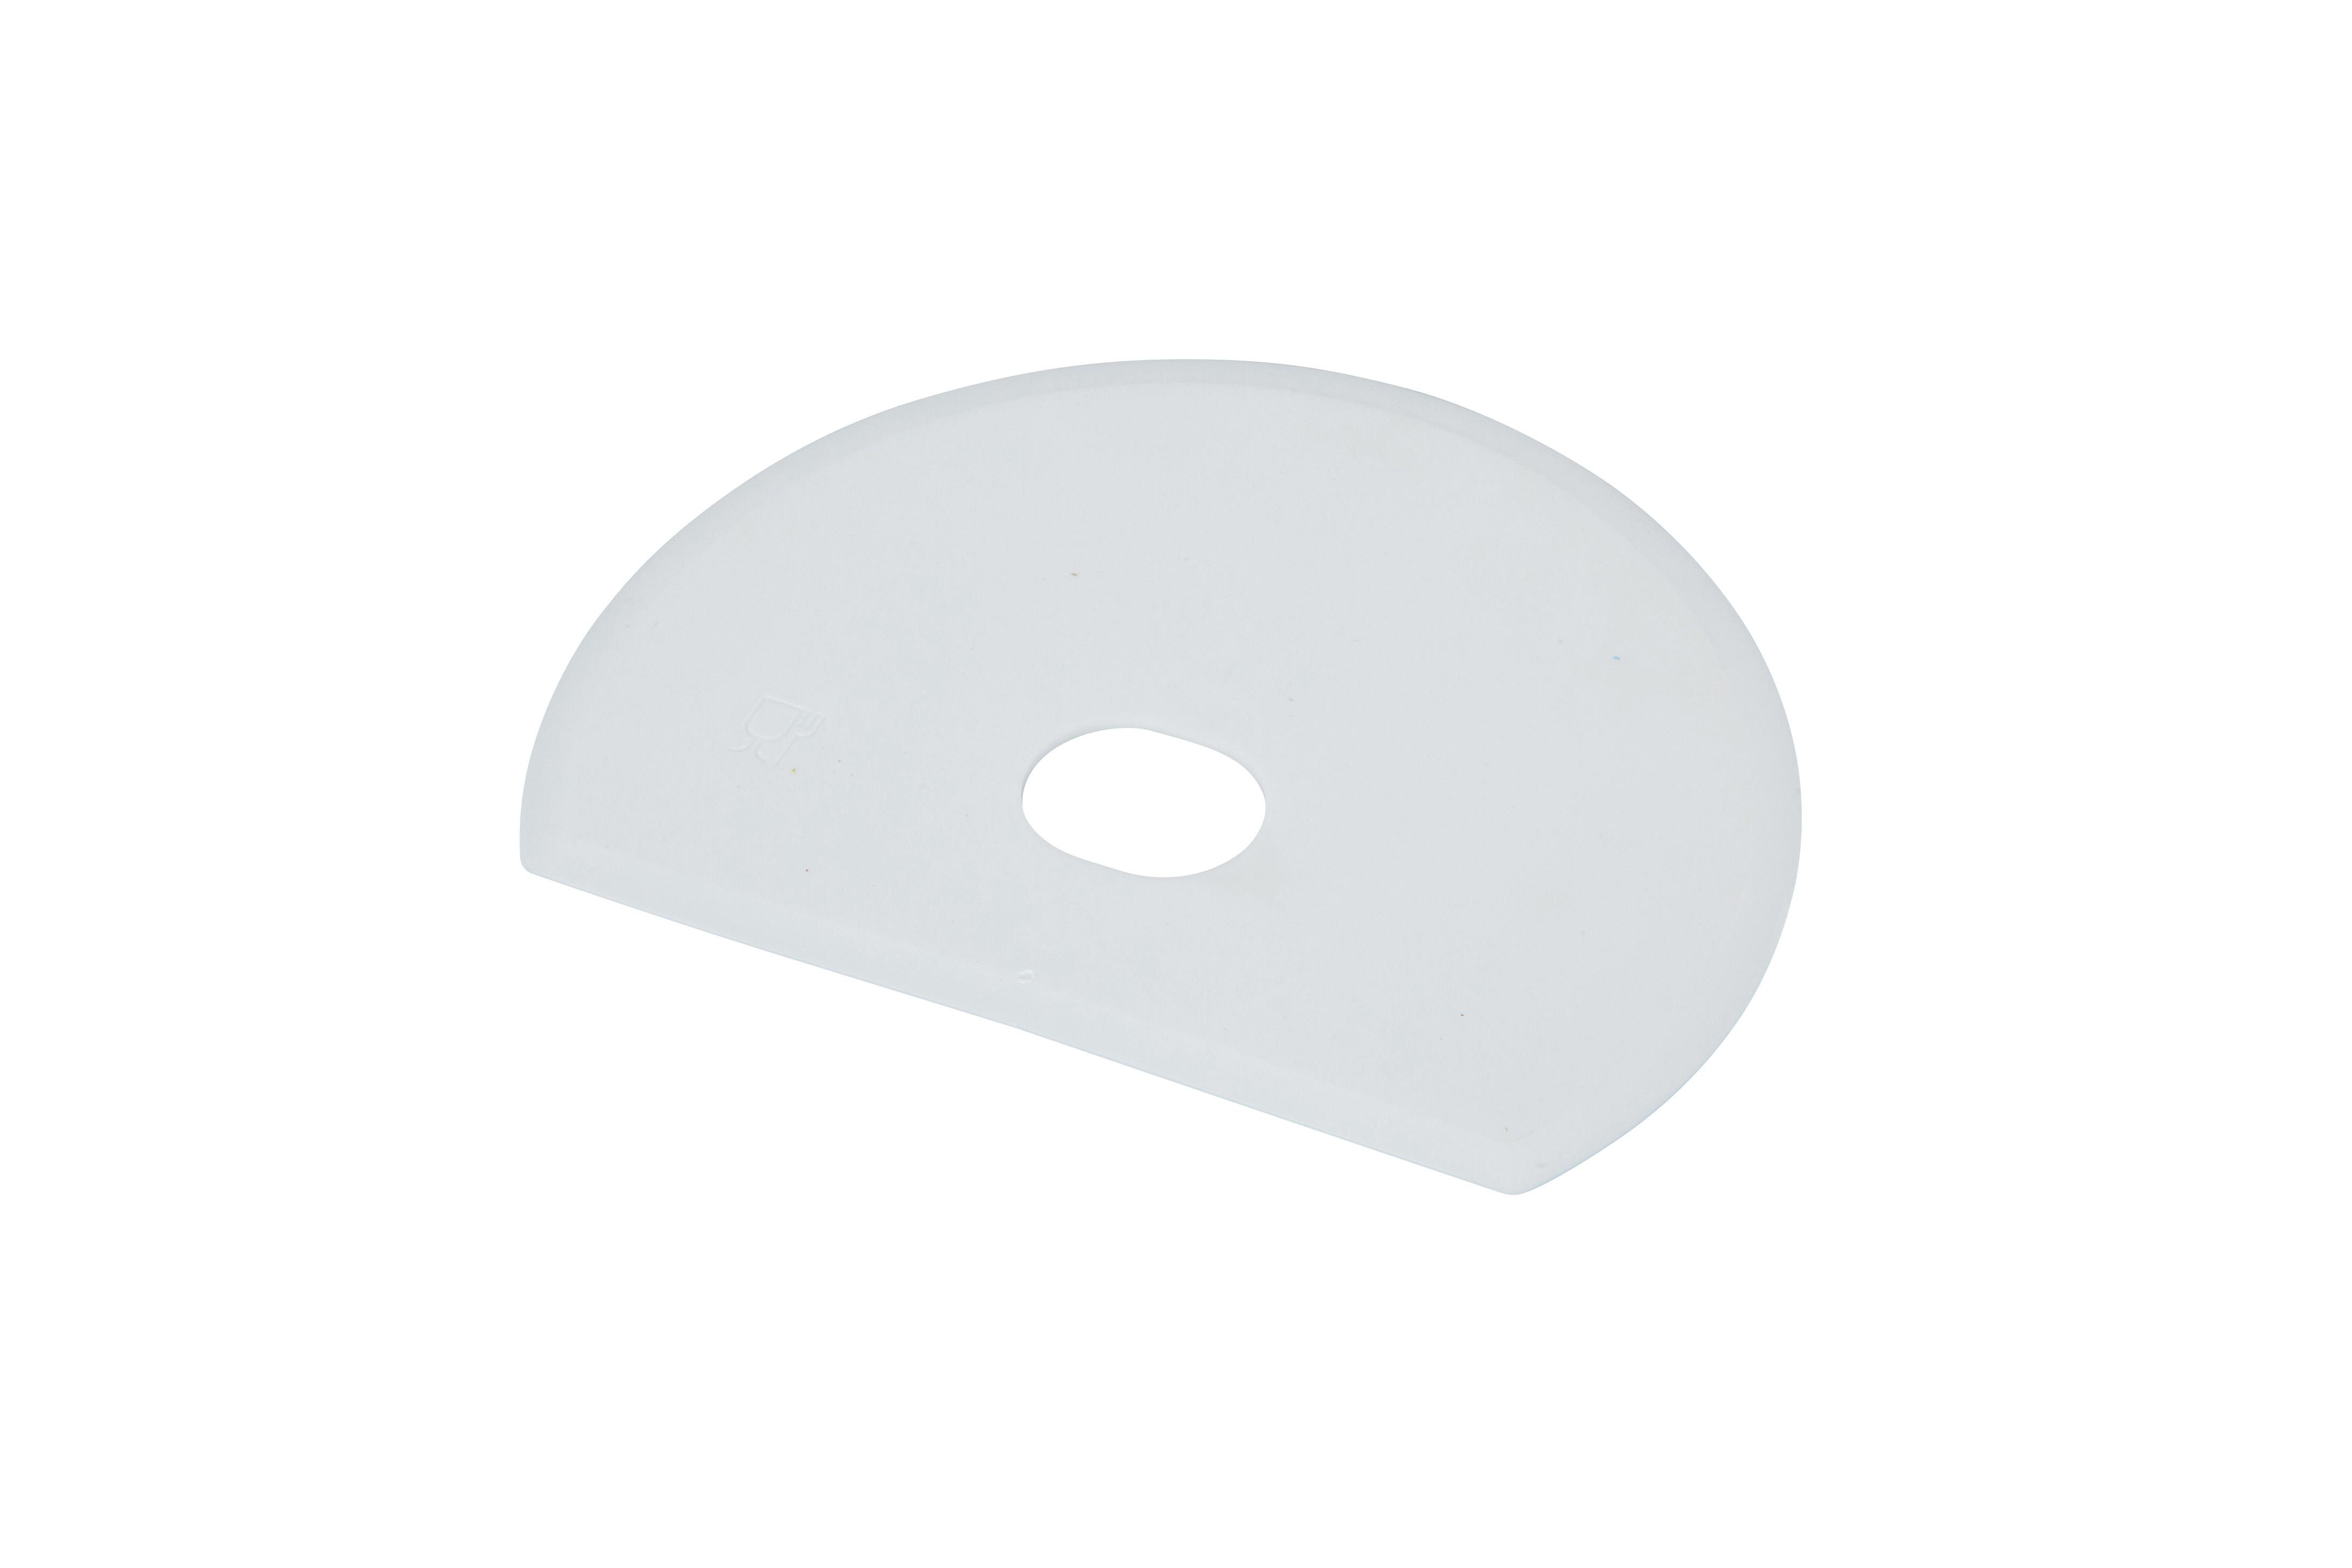 Unimop spaatel 160 x 125 x 1,65 mm, valge, kastis 20 tk